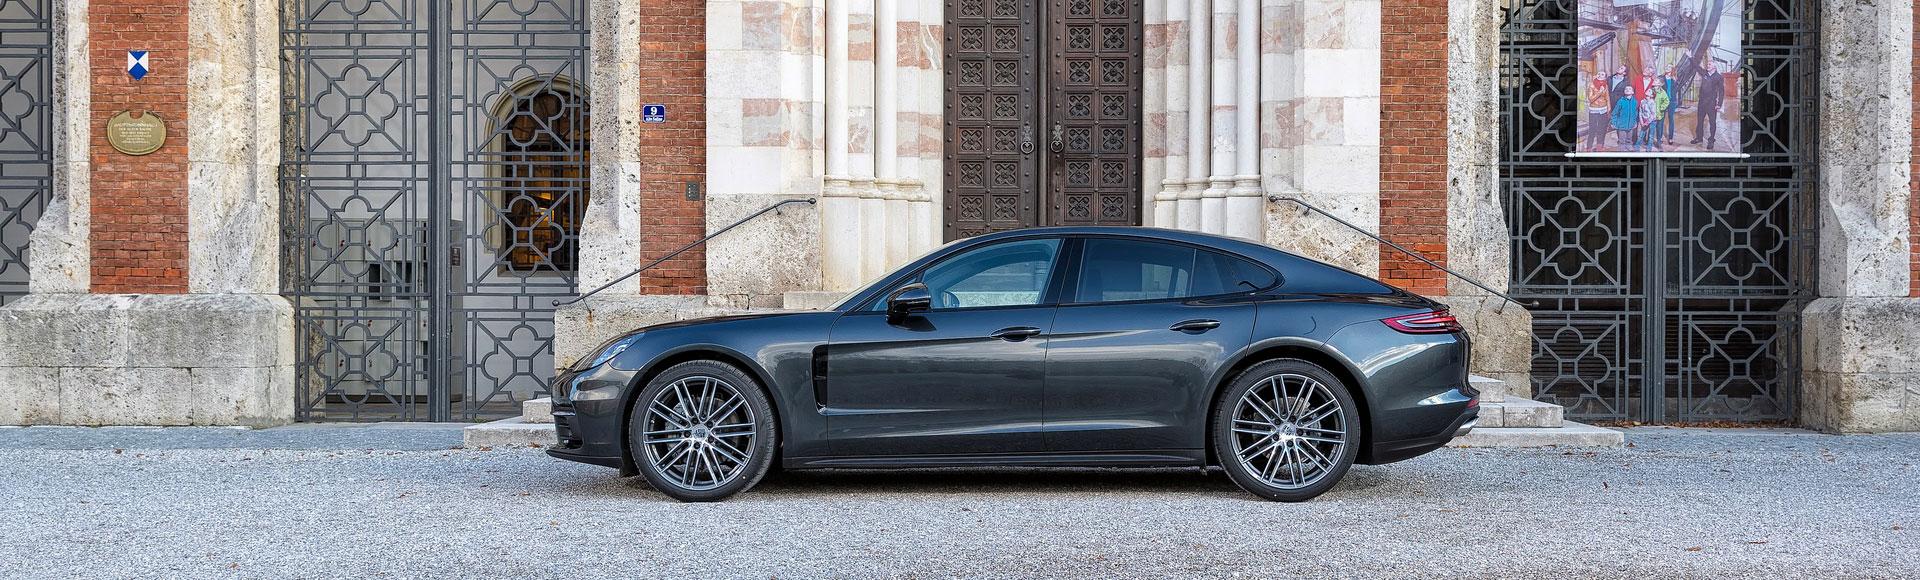 Porsche Panamera 2016 037